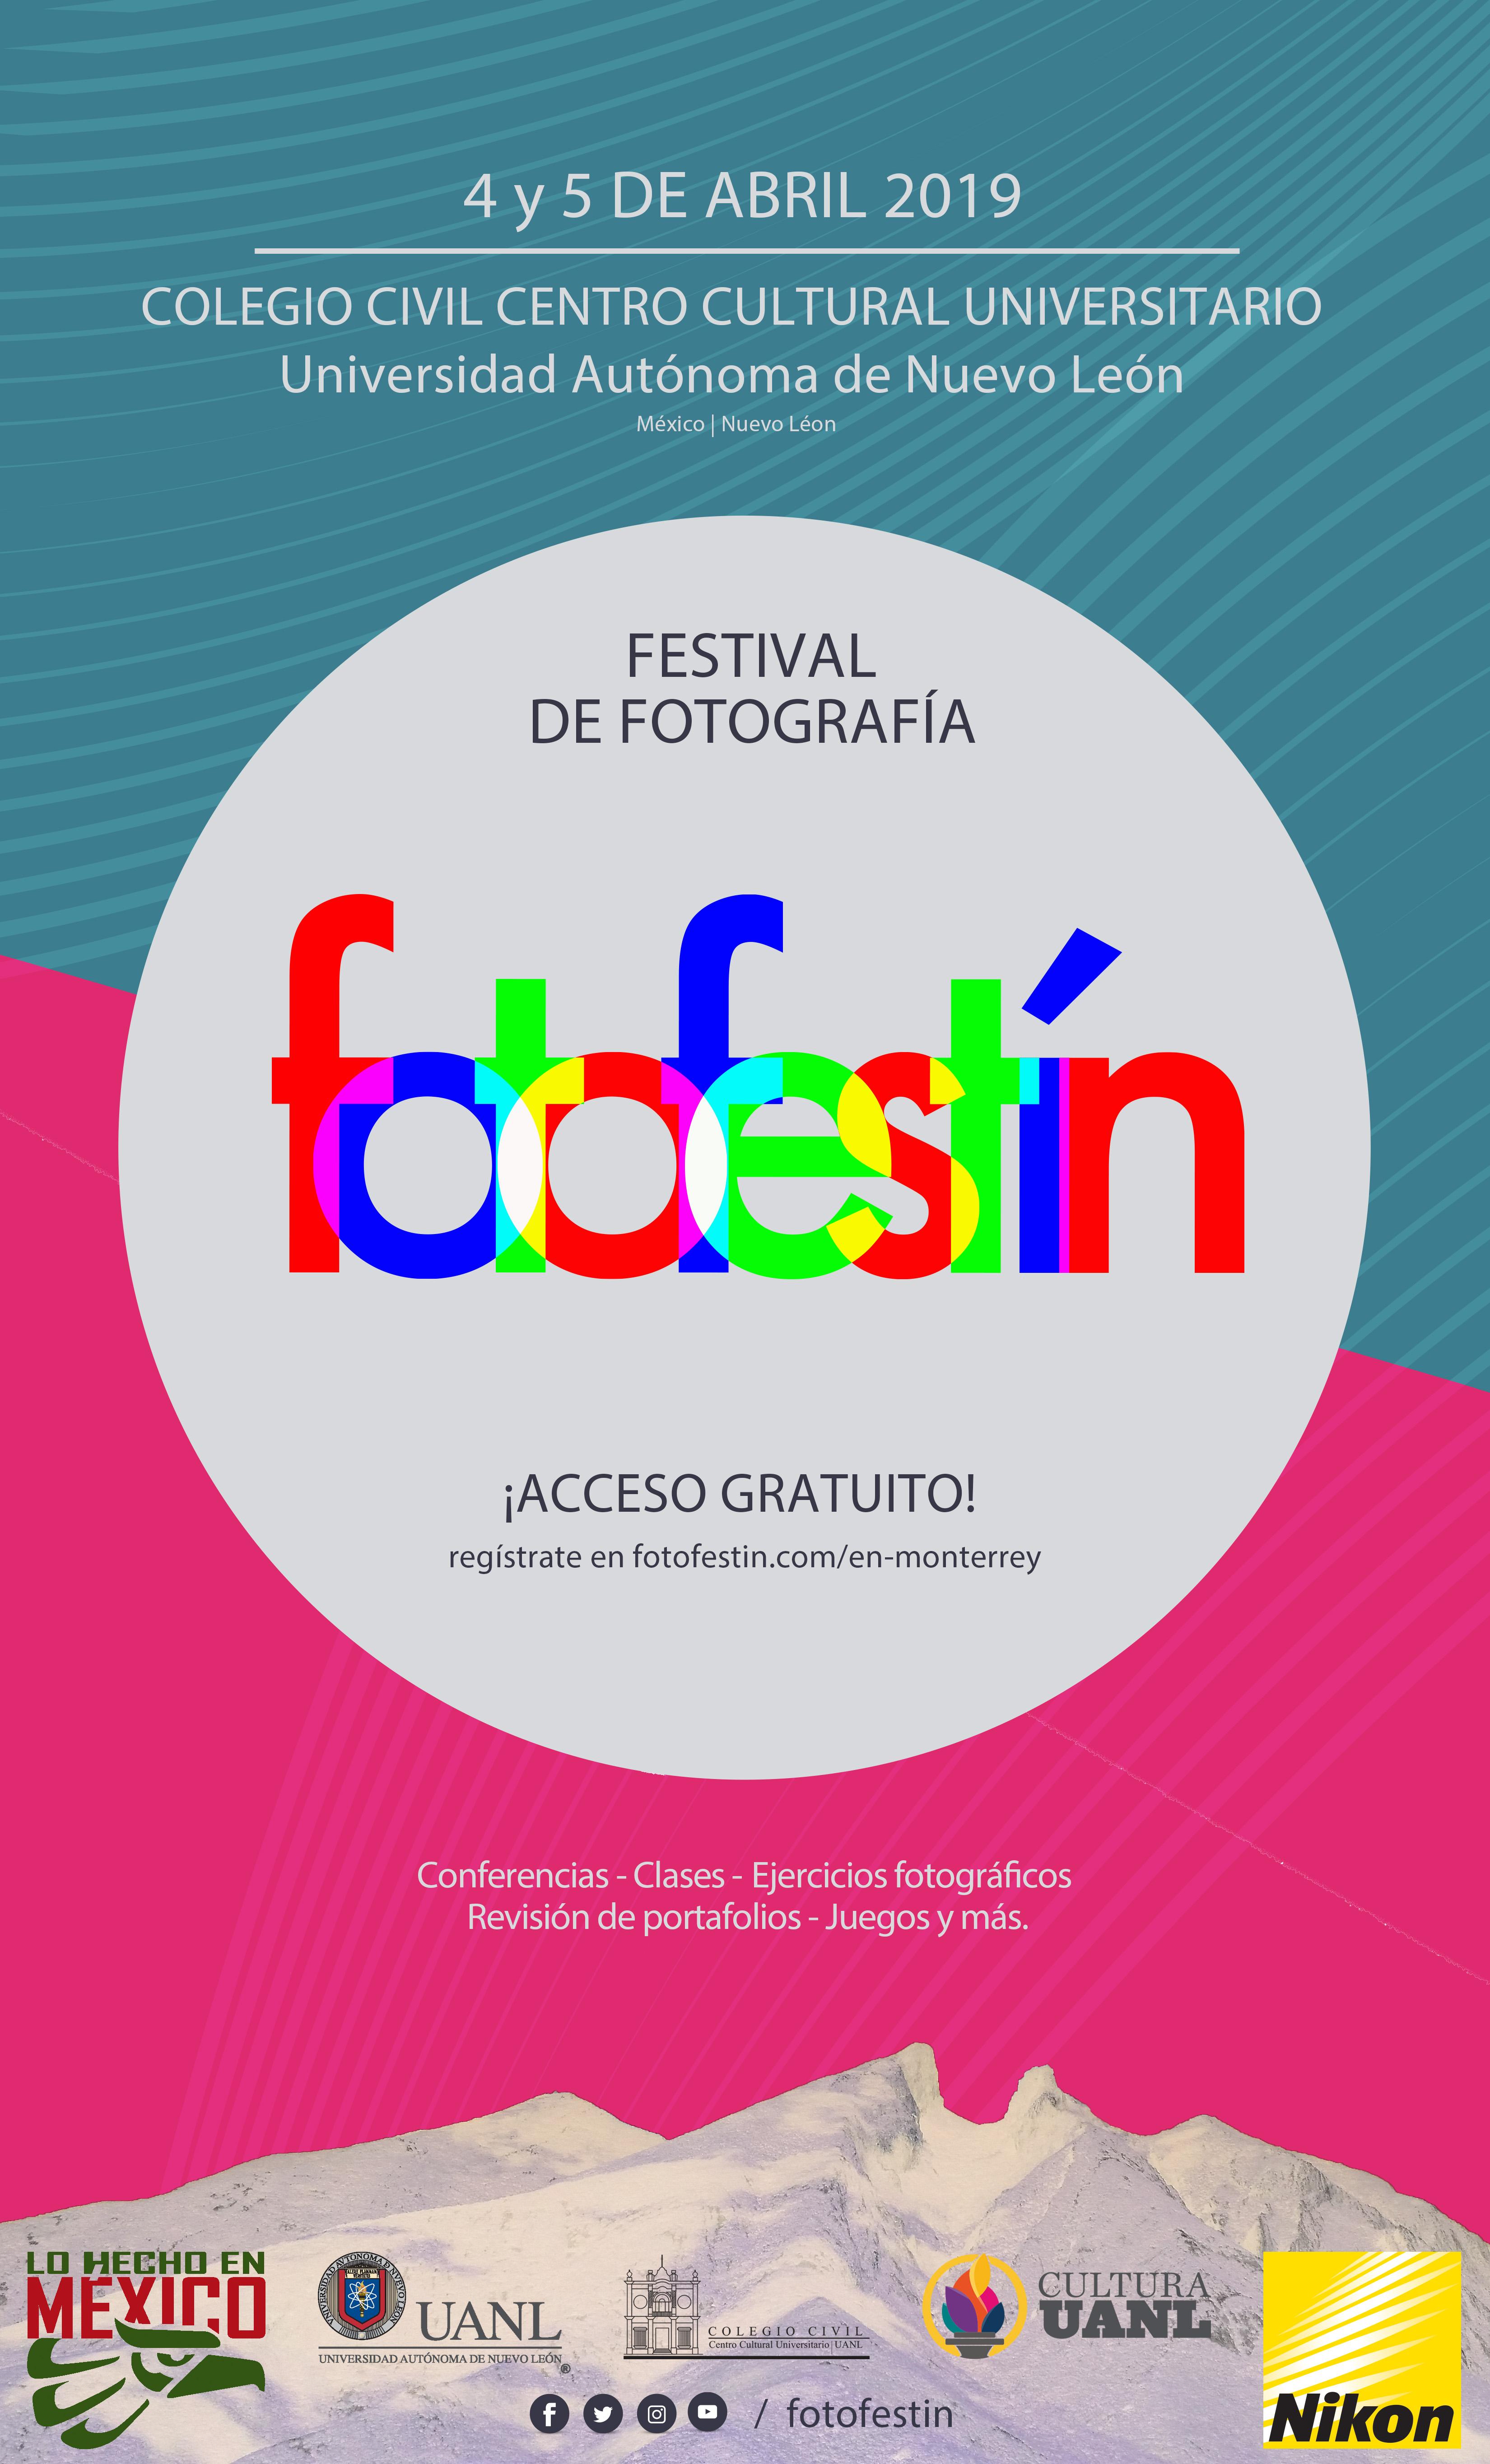 Festival de Fotografia fotofestín en la UANL monterrey nuevo león